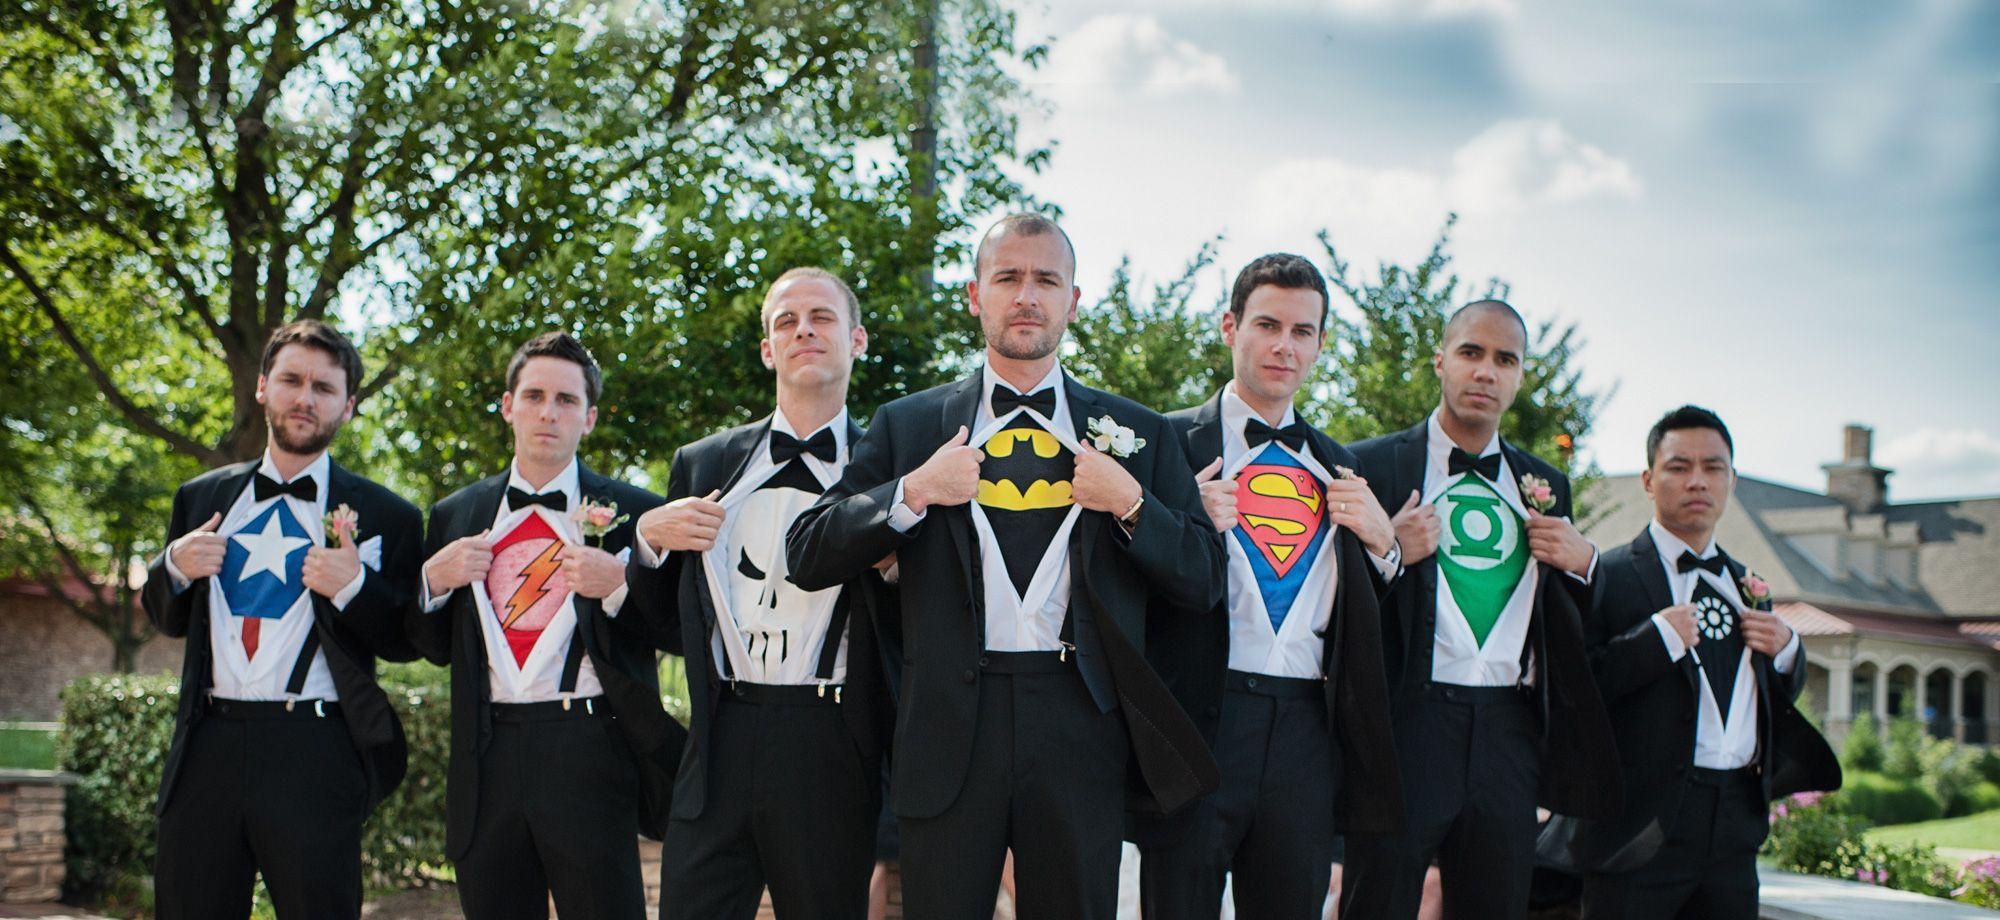 Funny Wedding Gifts For Groomsmen : ... stuff dream wedding wedding ideas golf wedding forward groomsmen